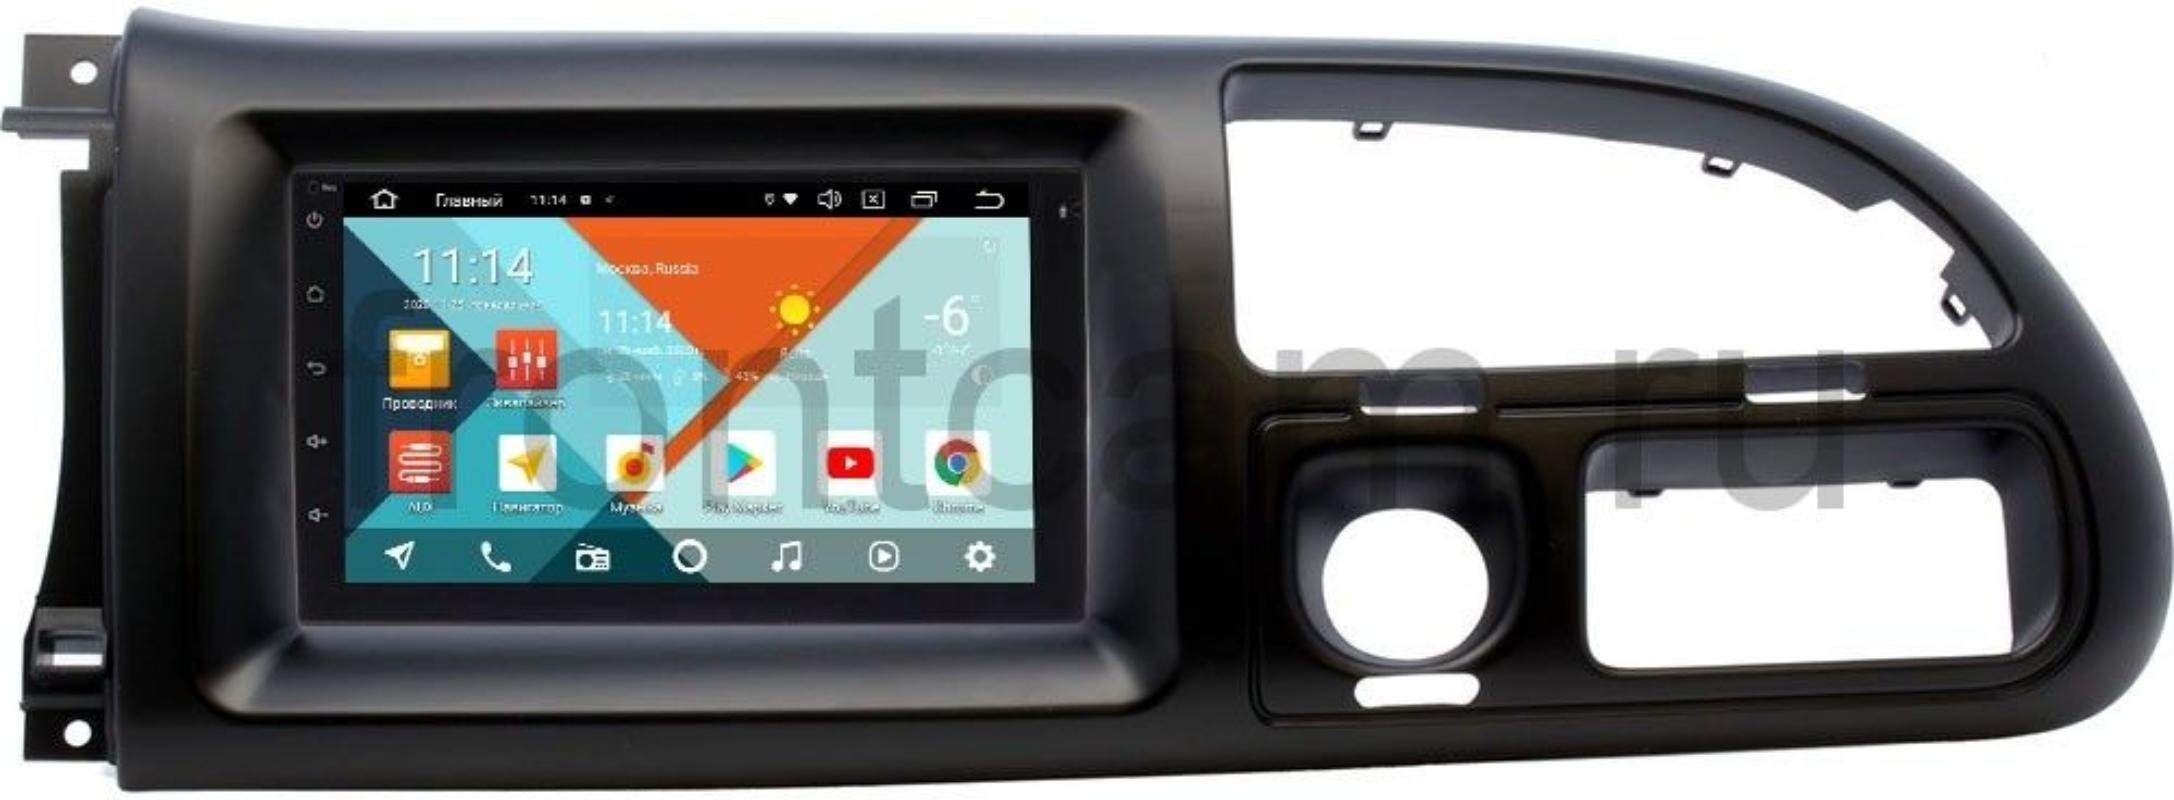 Магнитола в штатное место 2 din Ford Transit 2006-2010 Wide Media KS7001QR-3/32-RP-FRTR-93 на Android 10 (DSP CarPlay 4G-SIM) (+ Камера заднего вида в подарок!)